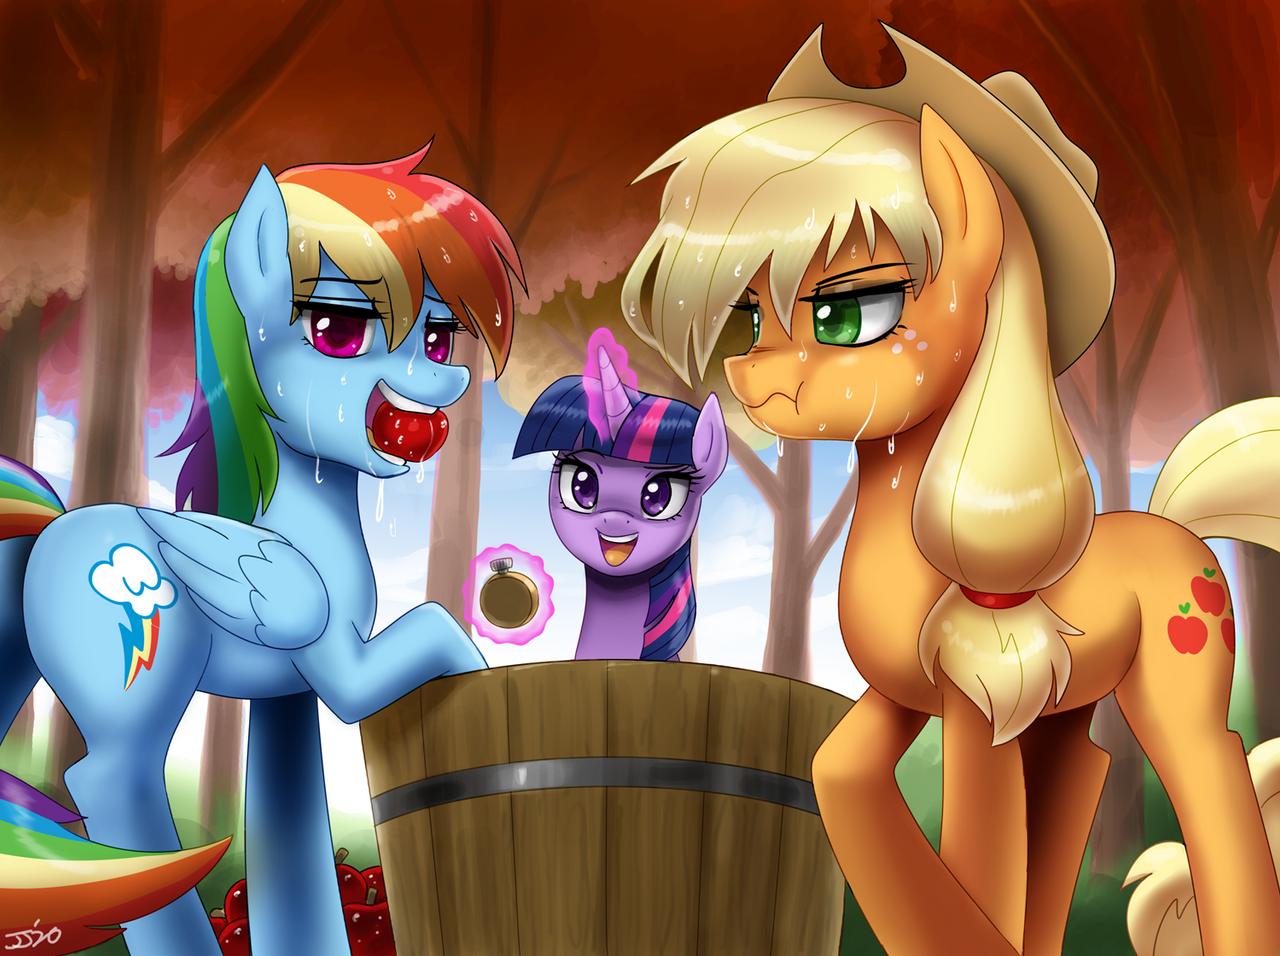 [Obrázek: how_about_them_apples__by_johnjoseco_de8...Y8fguUBtiM]